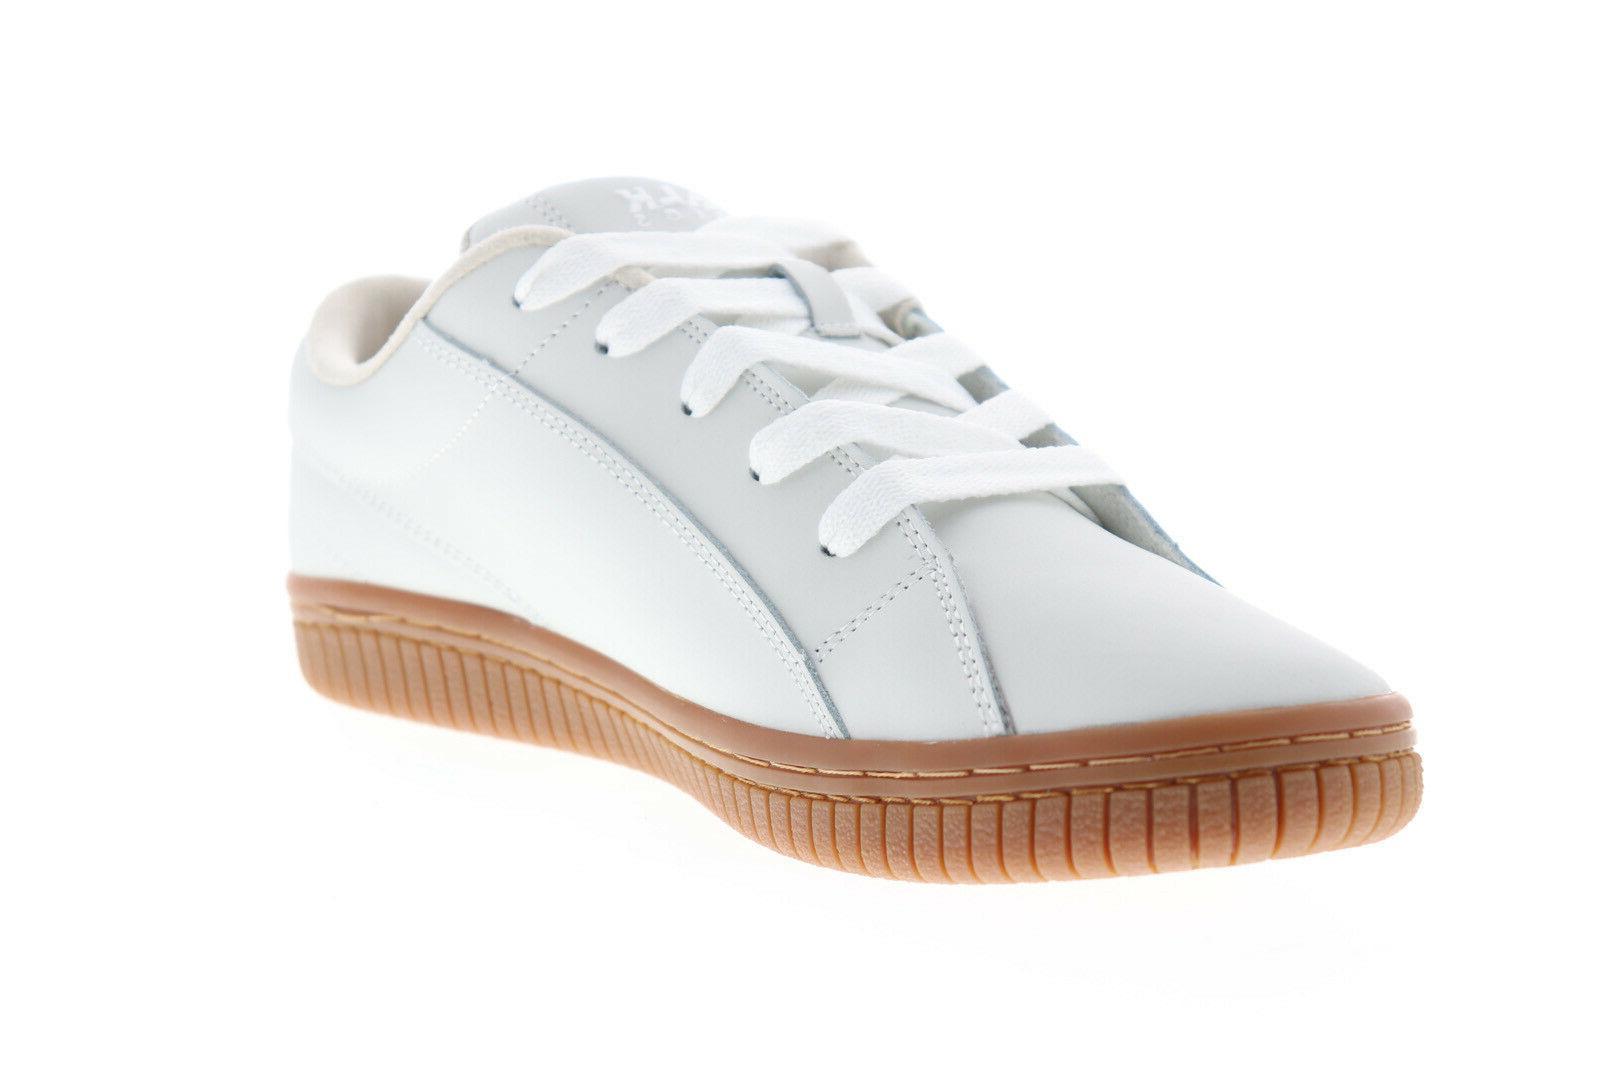 Airwalk One Gum Men's 12 Shoes Leather New NIB